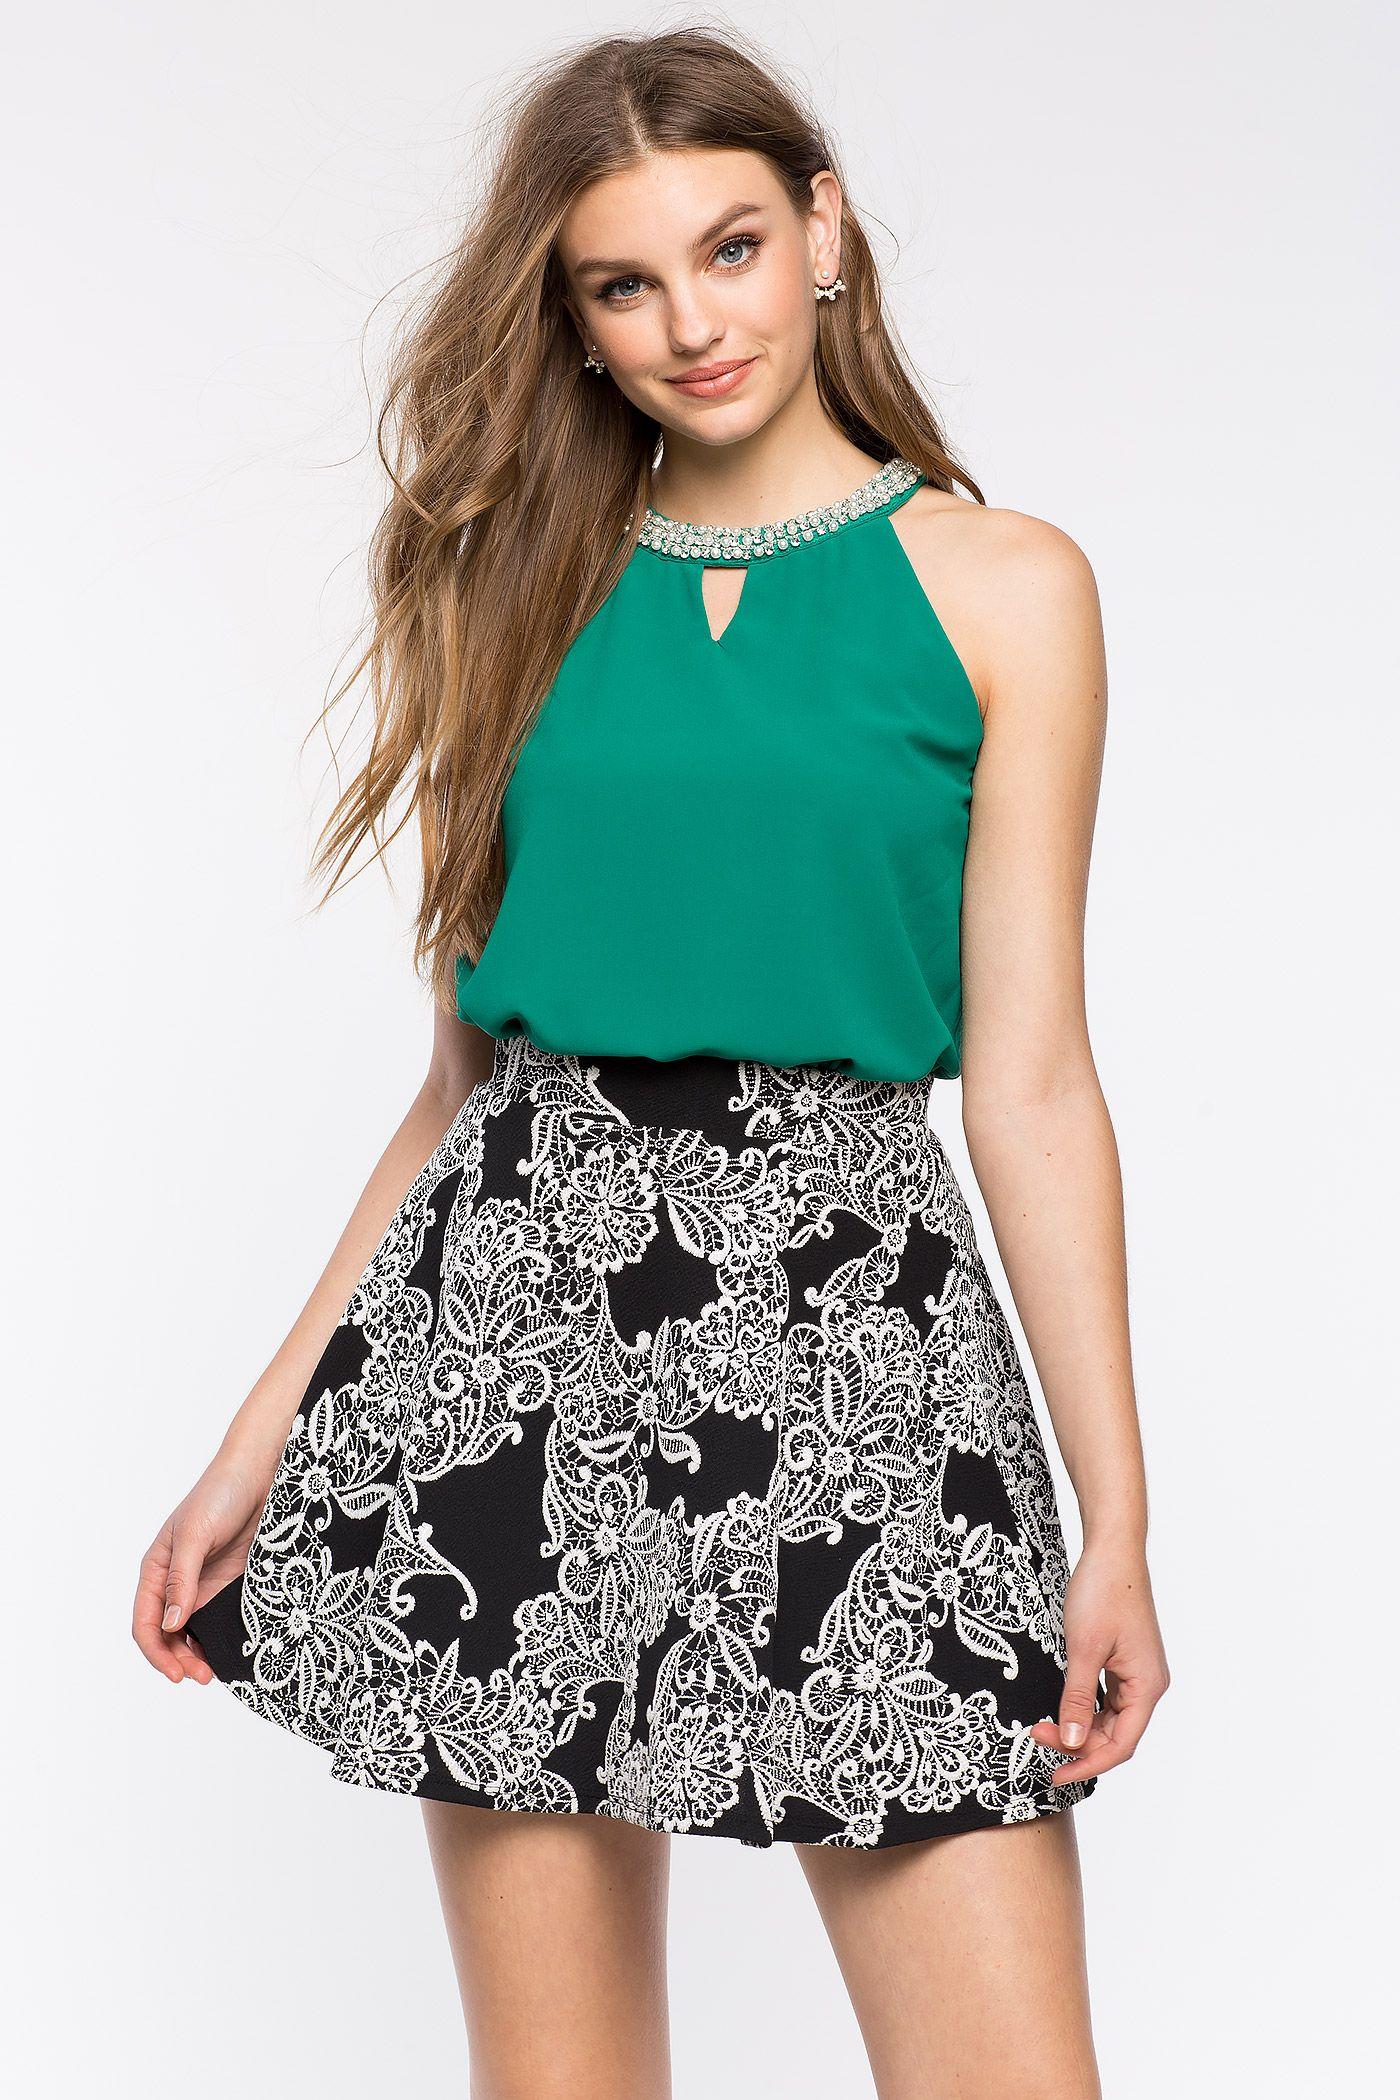 Блуза Размеры: S, M, L Цвет: изумрудный, белый Цена: 1285 руб.     #одежда #женщинам #блузы #коопт